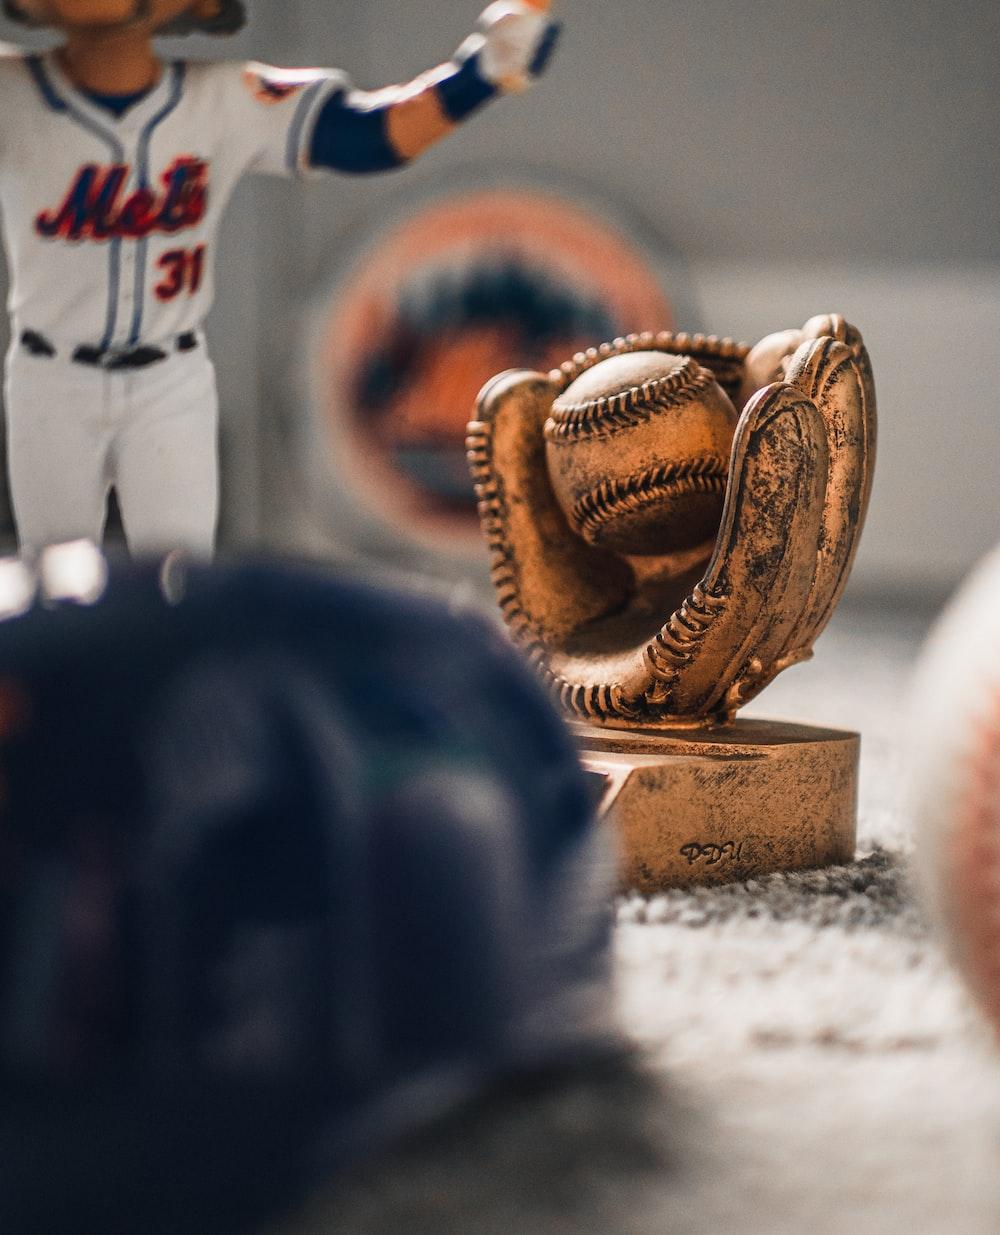 beige baseball with mitt